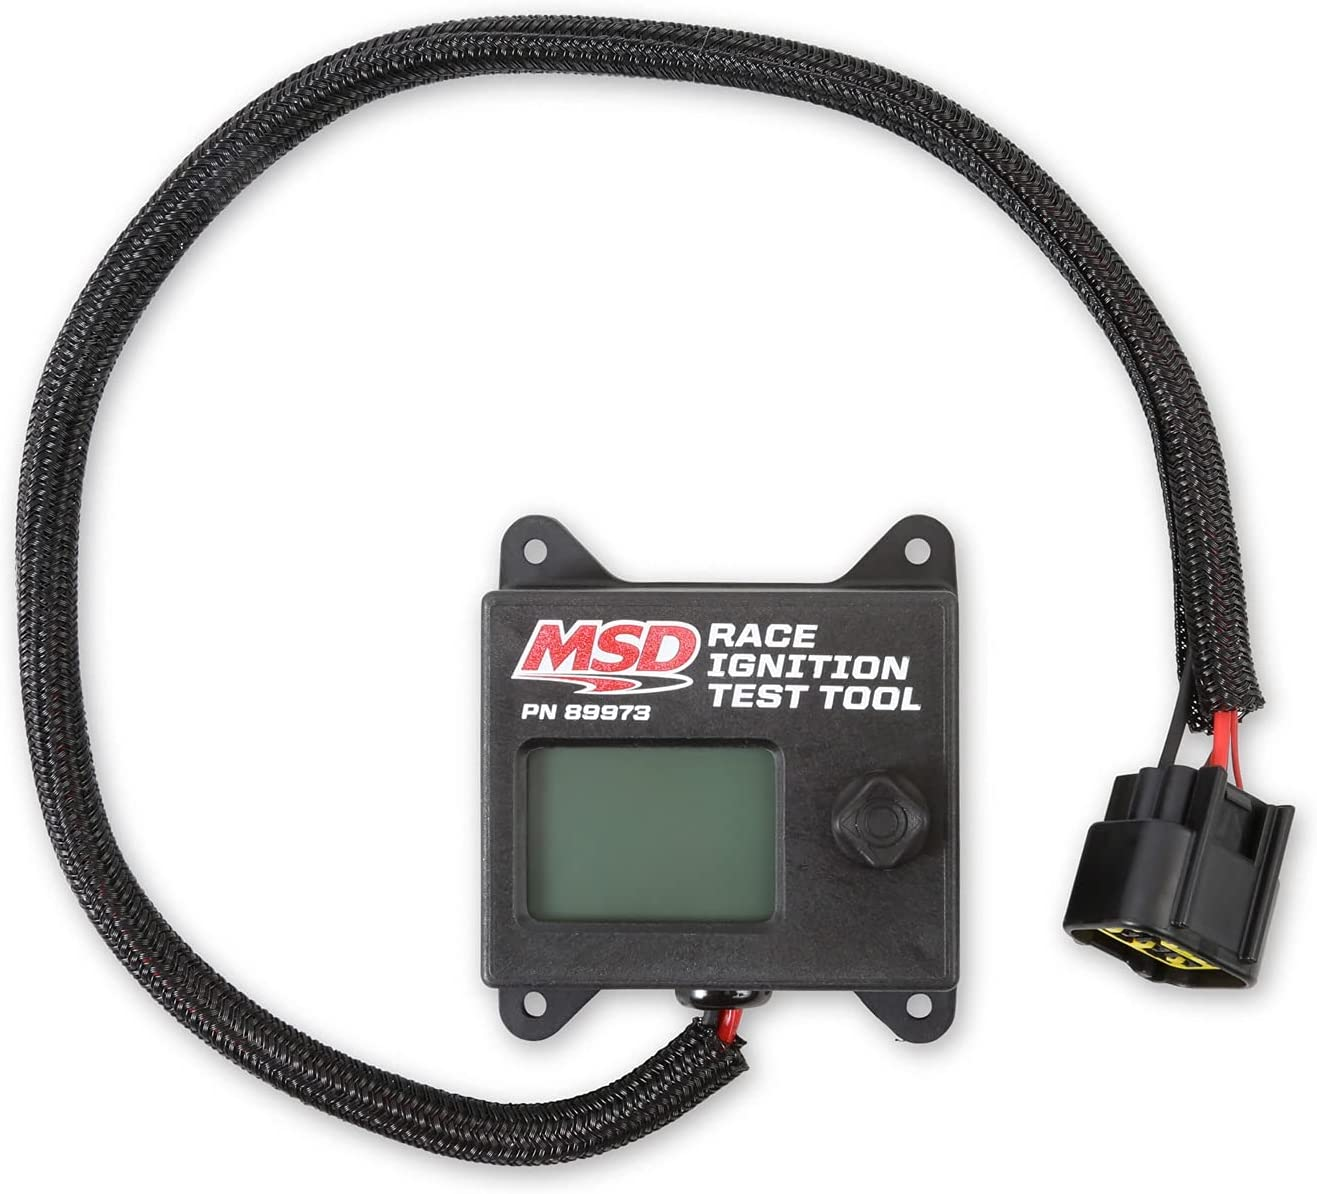 MSD [Alternative dealer] Max 51% OFF 89973 Race Test Tool Ignition